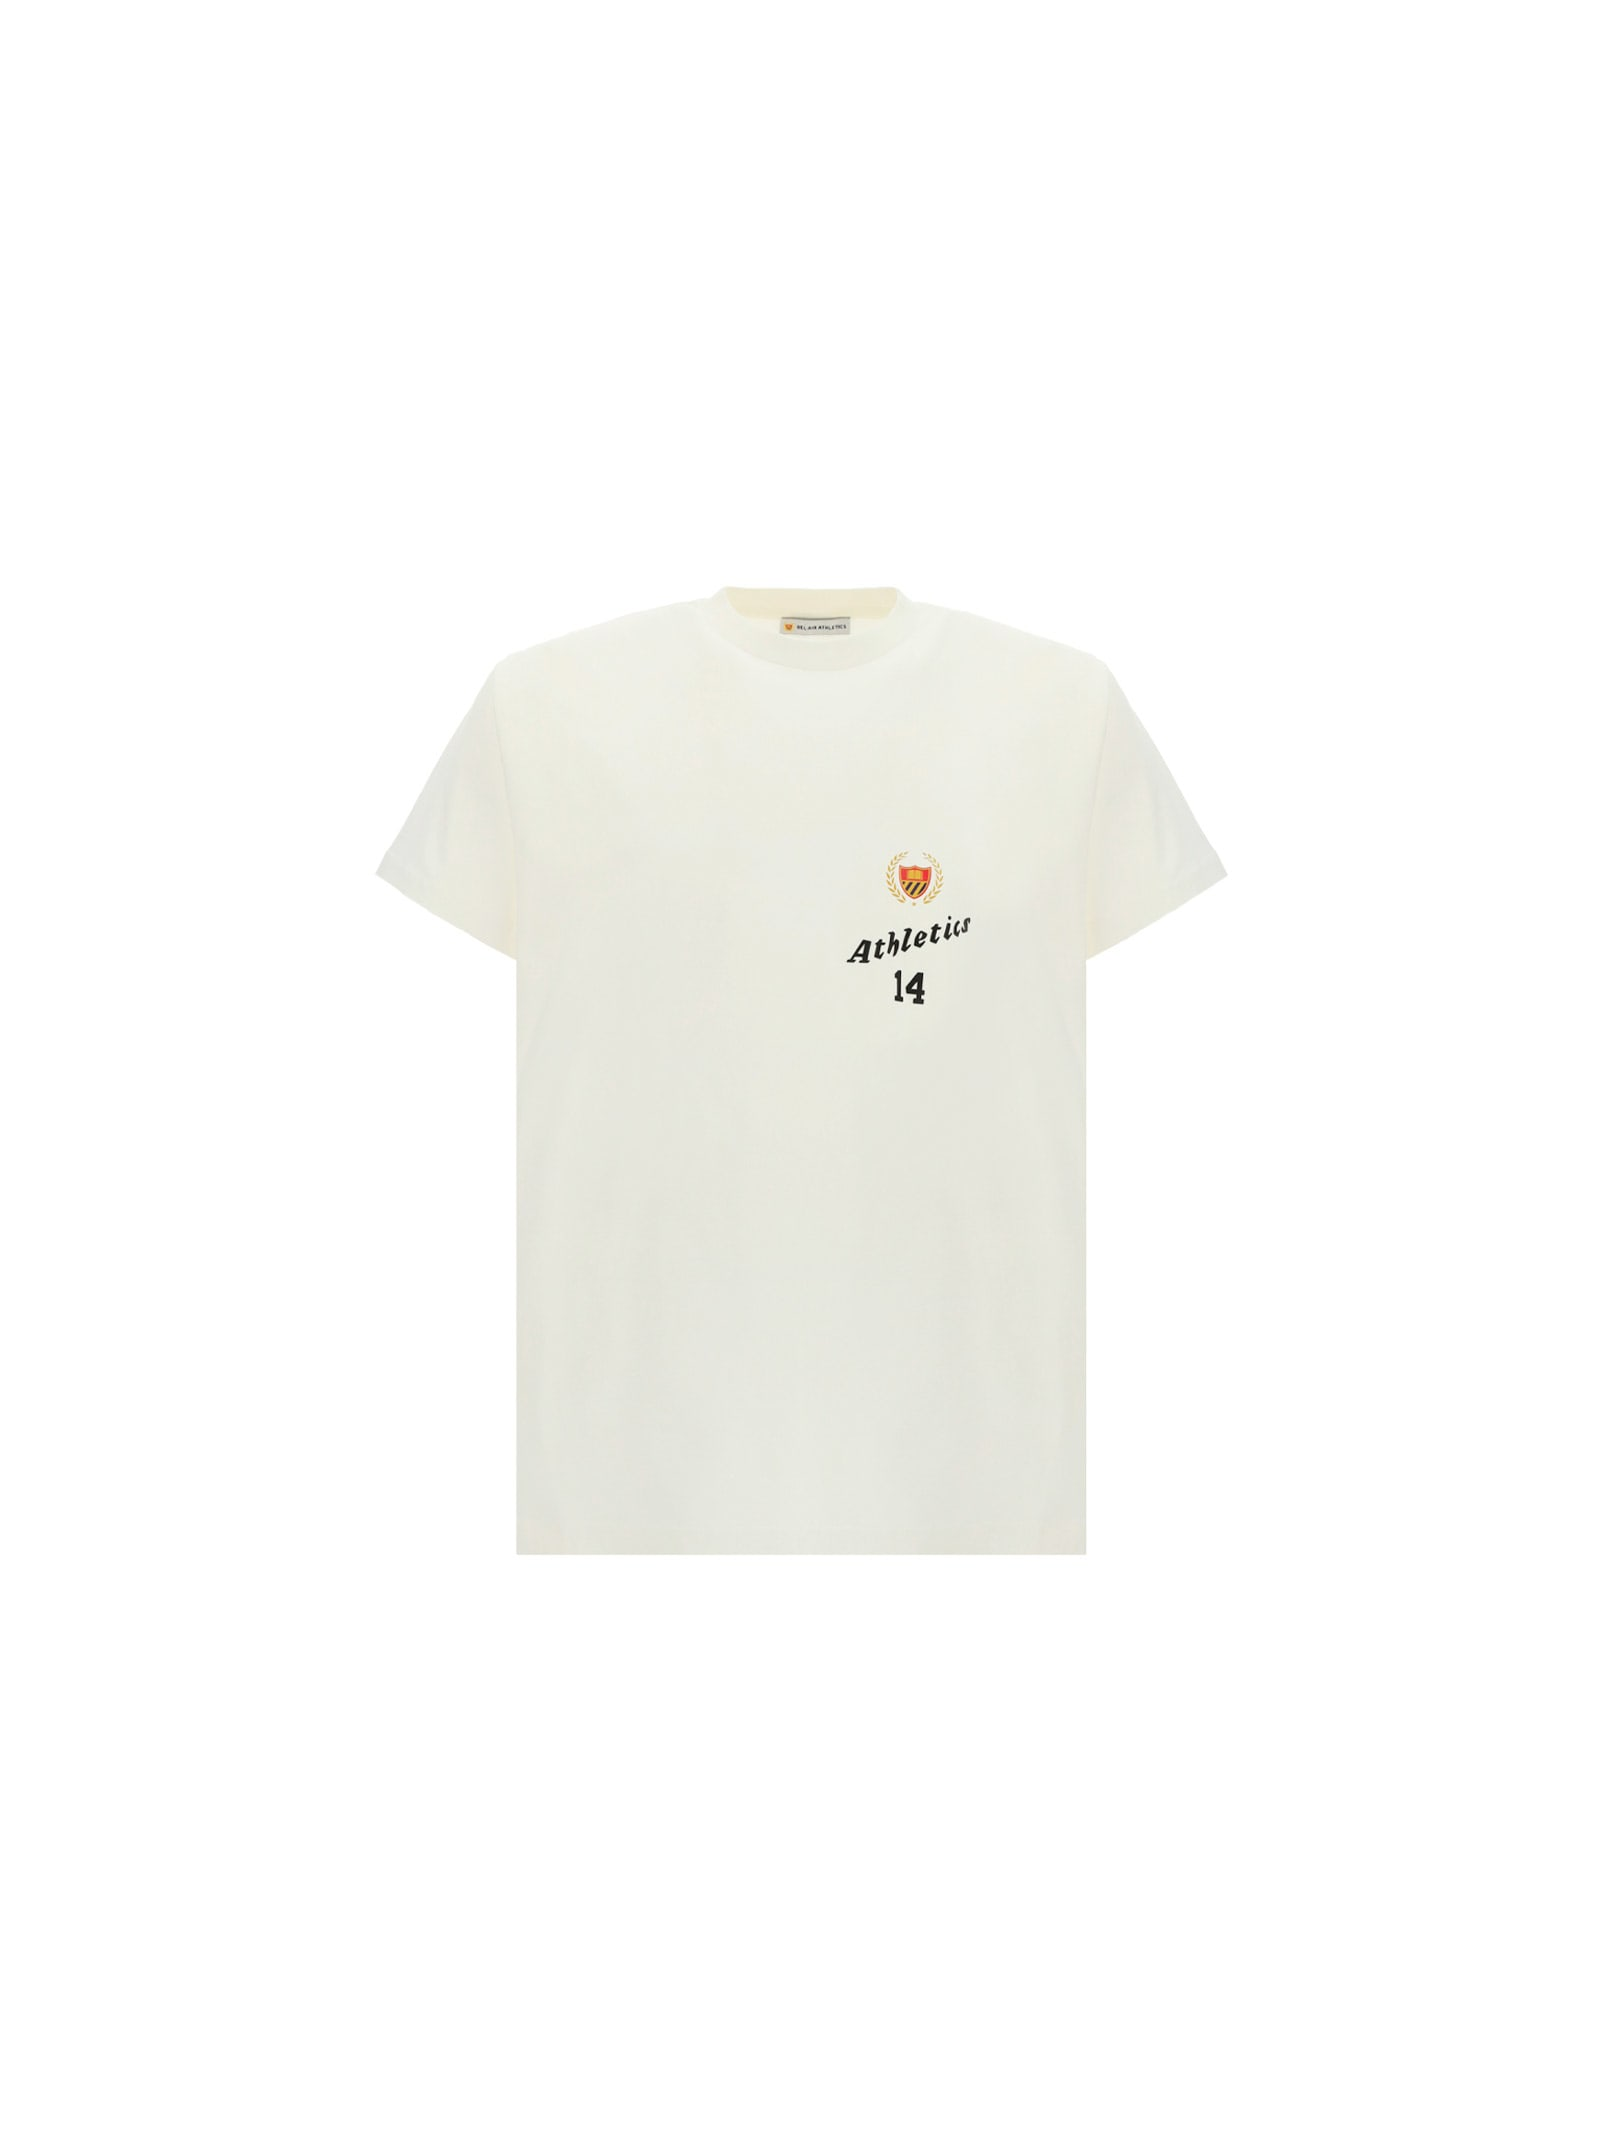 Bel Air Athletics T-shirt